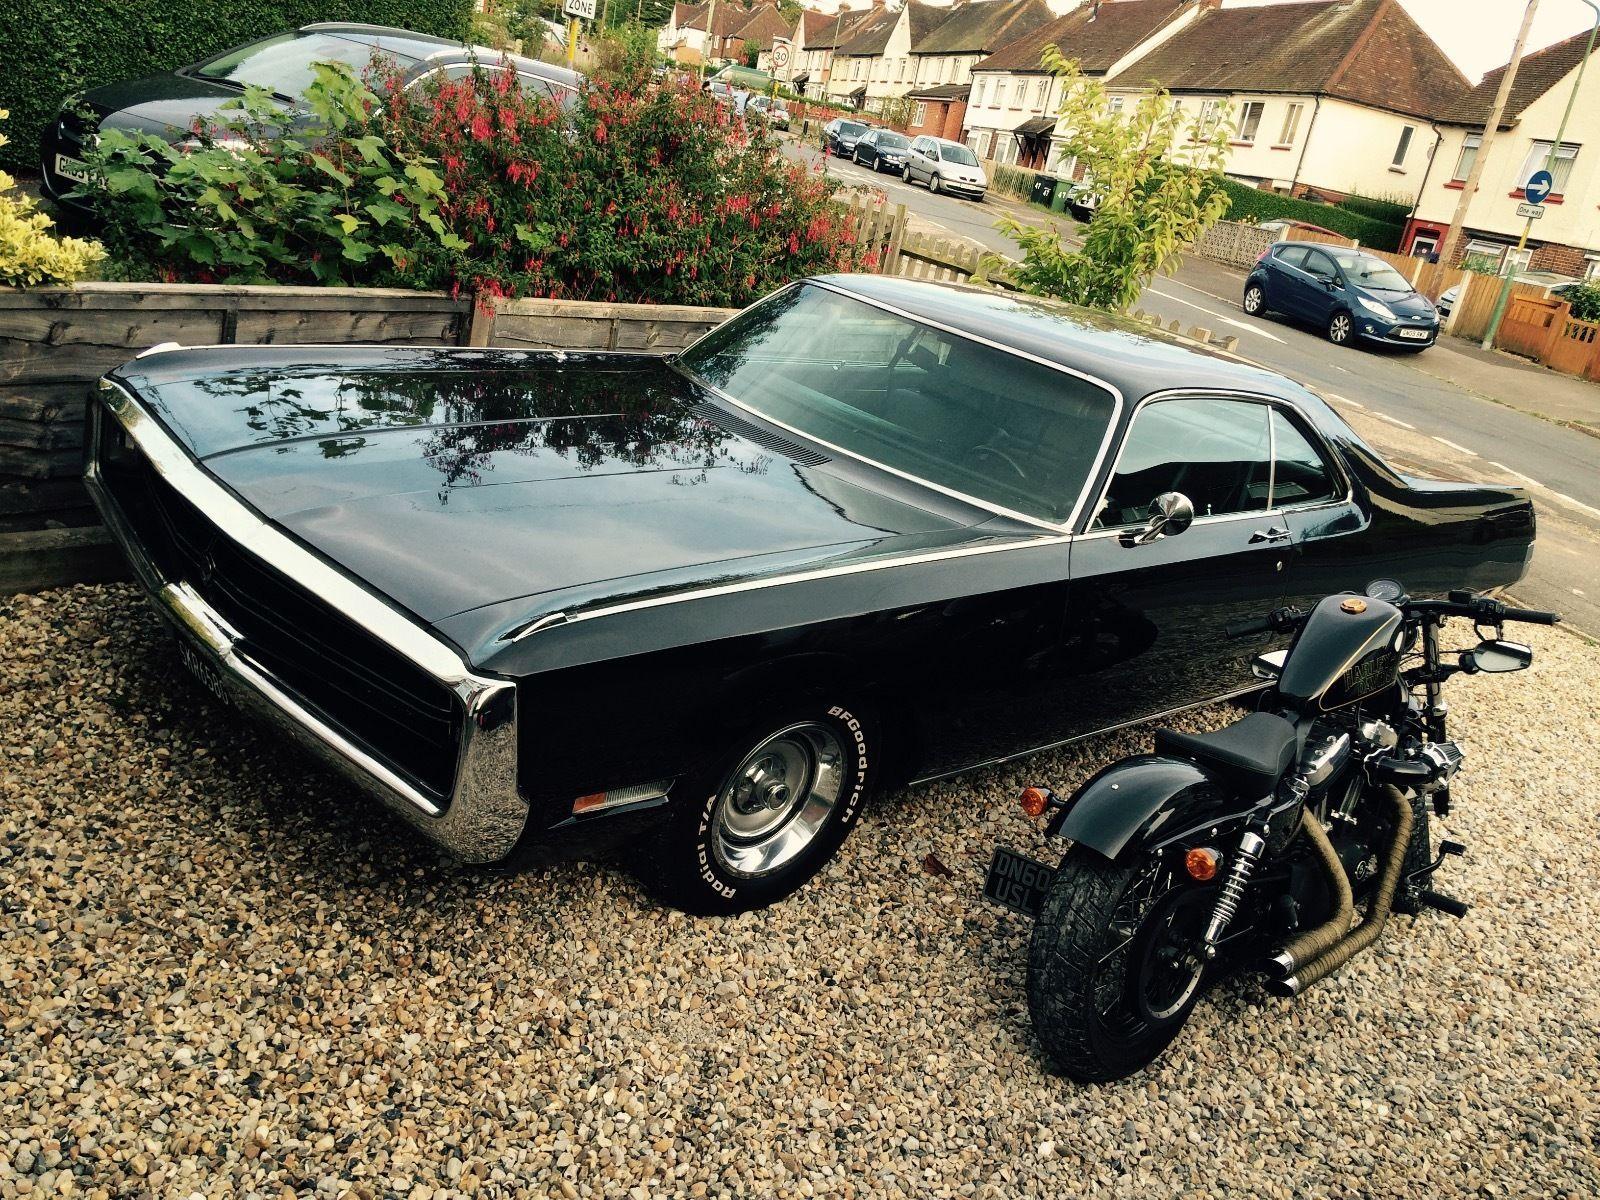 1969 Chrysler 300 440ci MOPAR | American classic cars, Car shop and ...